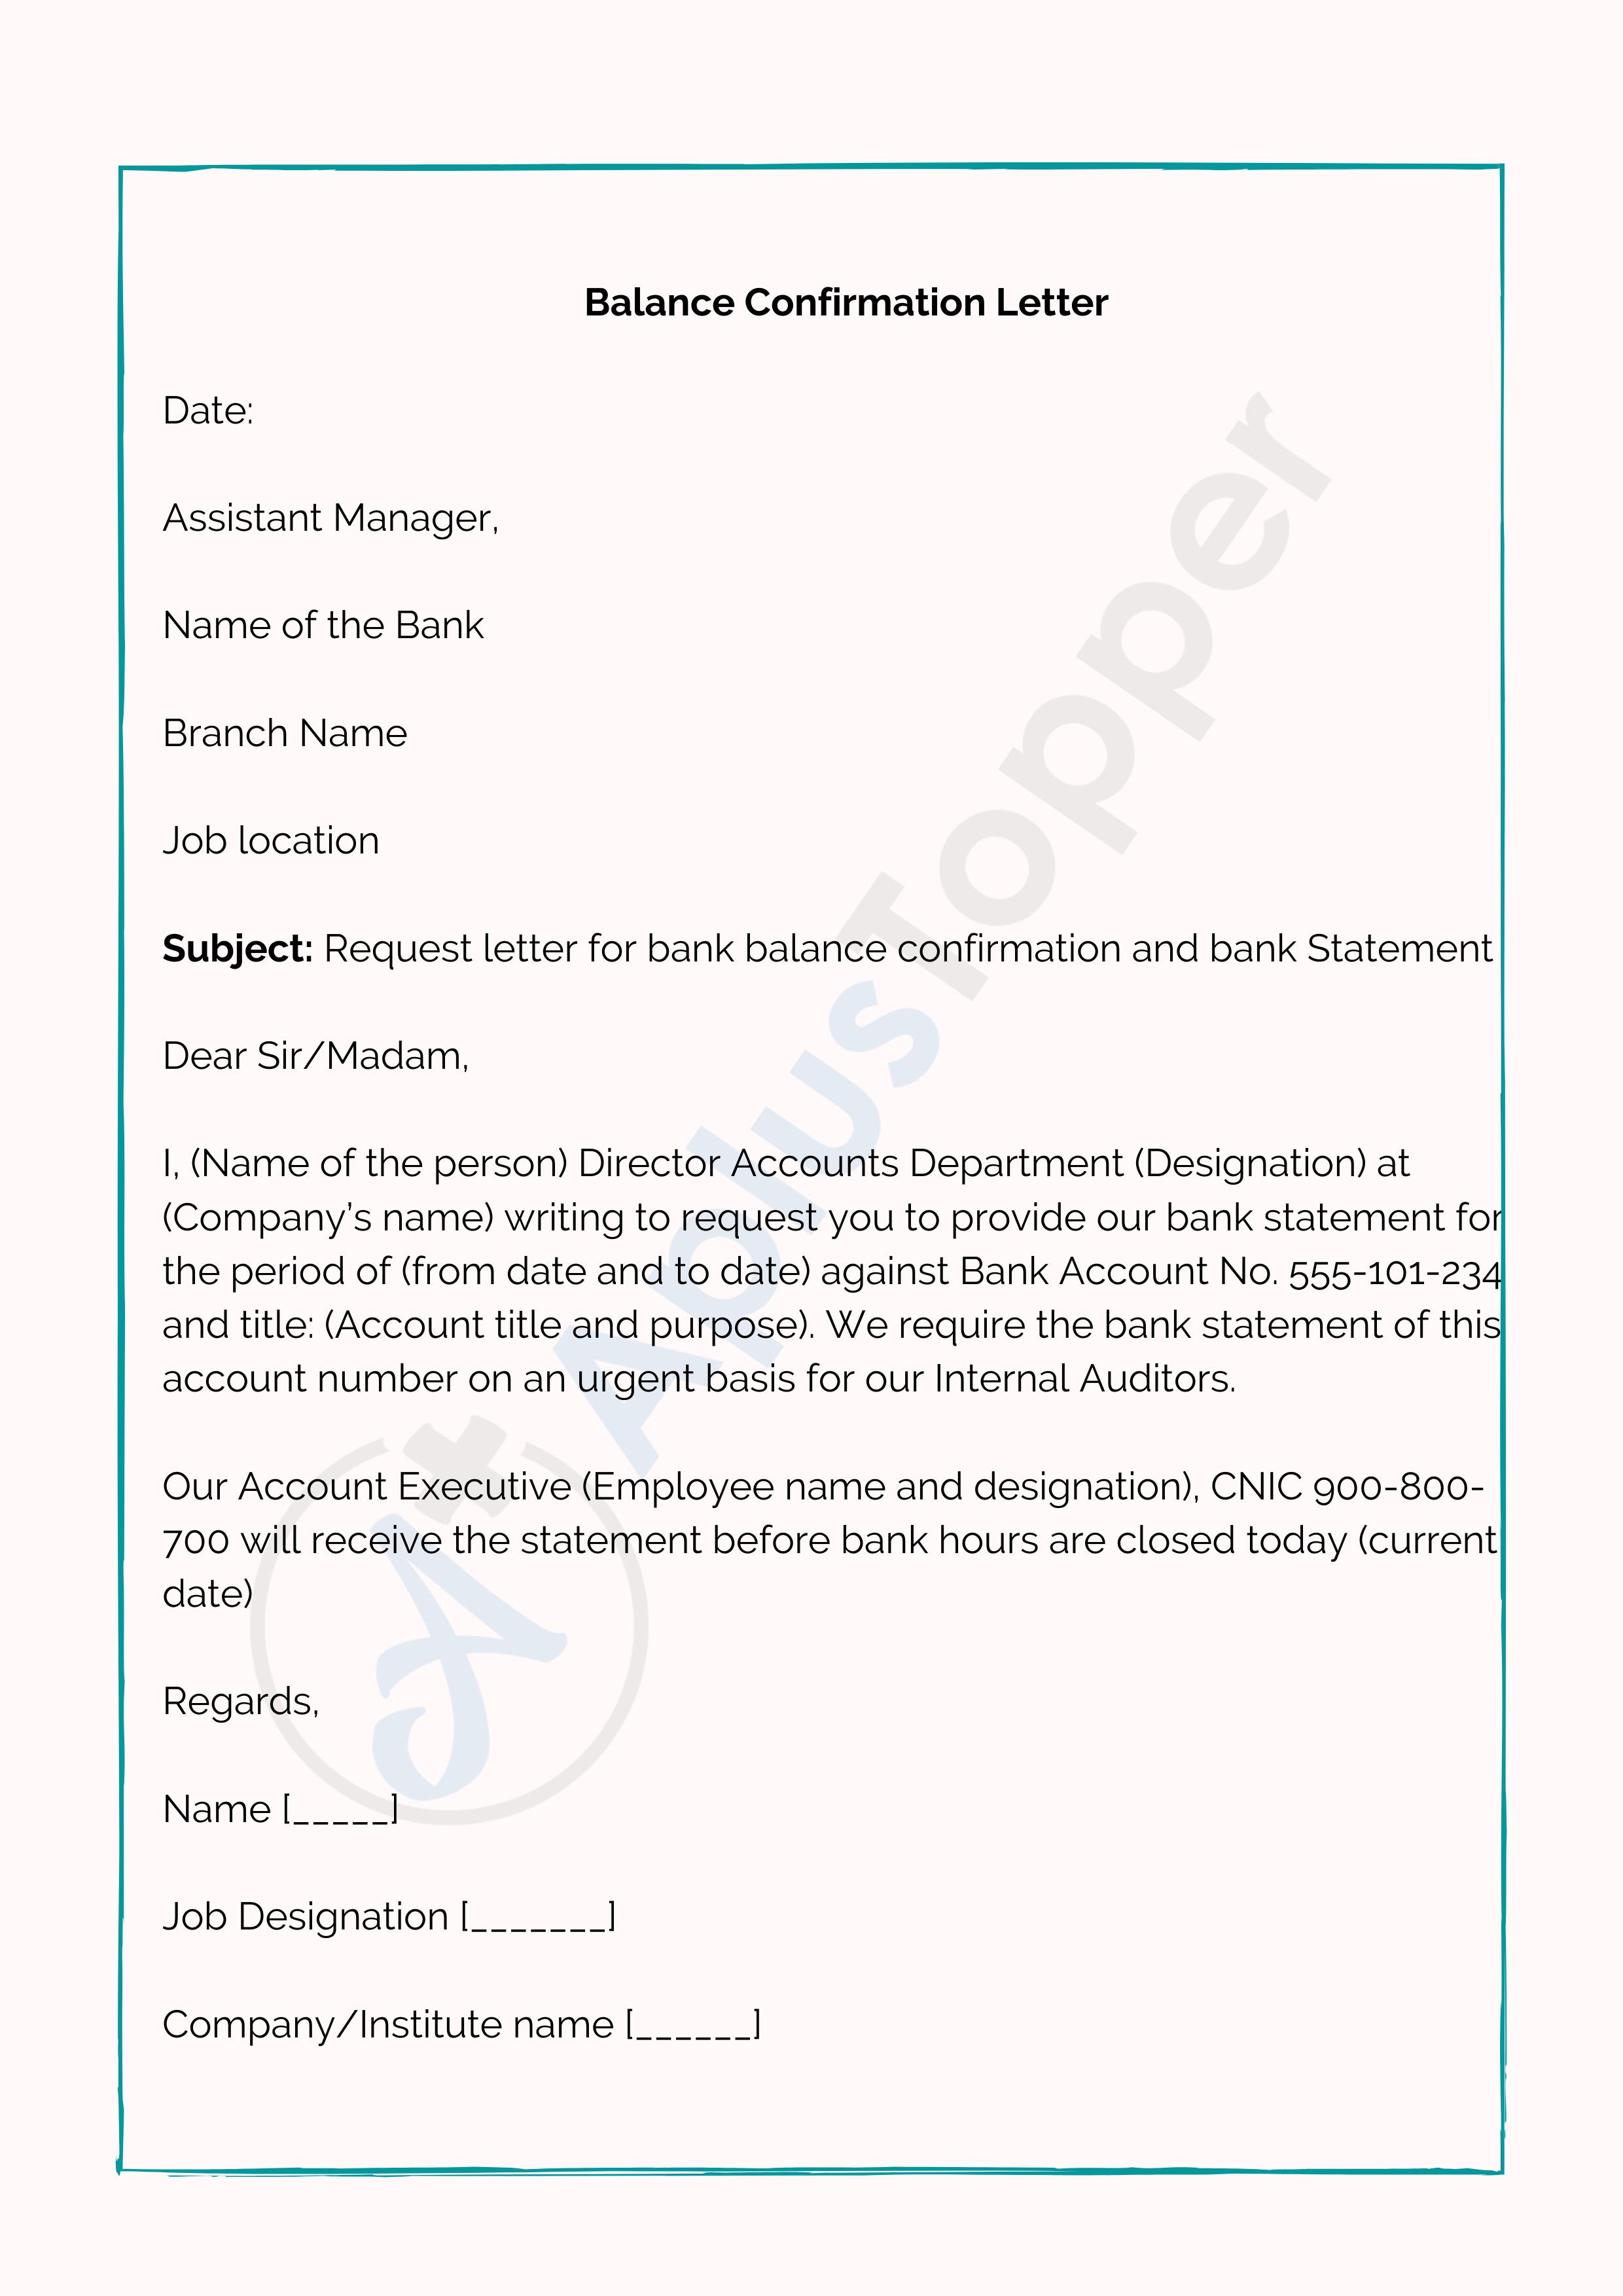 Balance Confirmation Letter